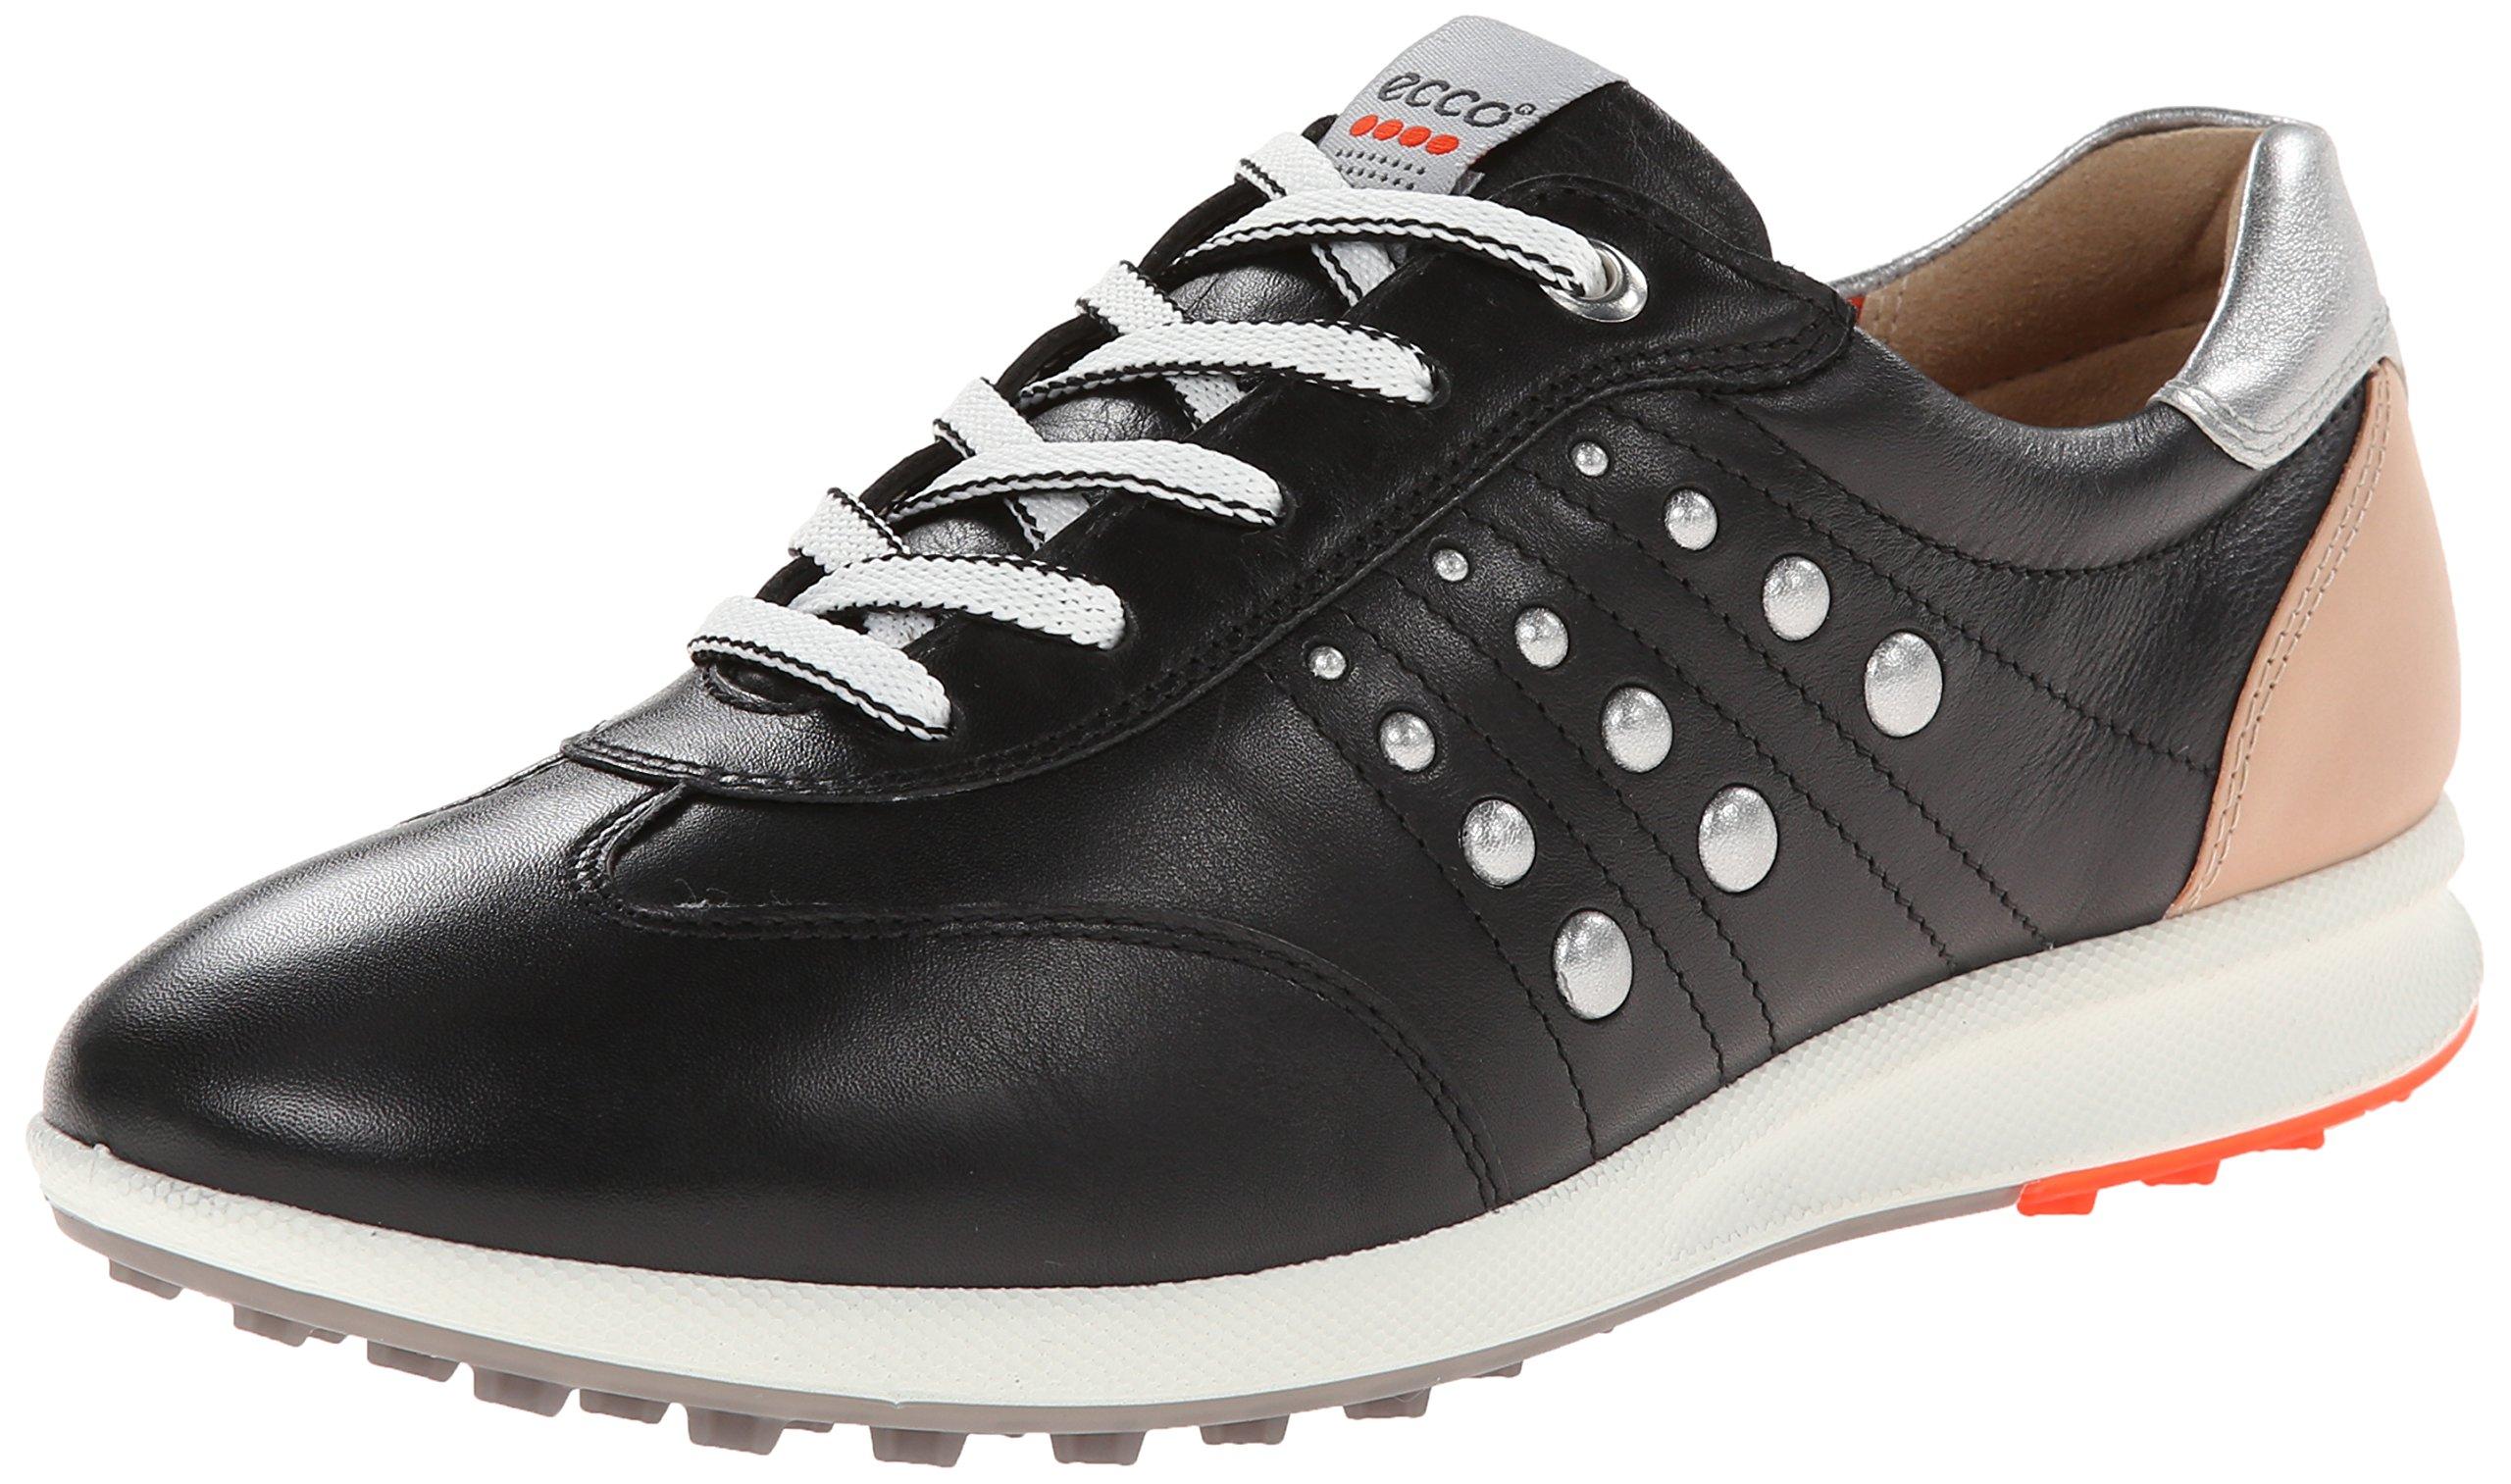 ECCO Women's Street EVO One Luxe Golf Shoe,Black/Fire,39 EU/8-8.5 M US